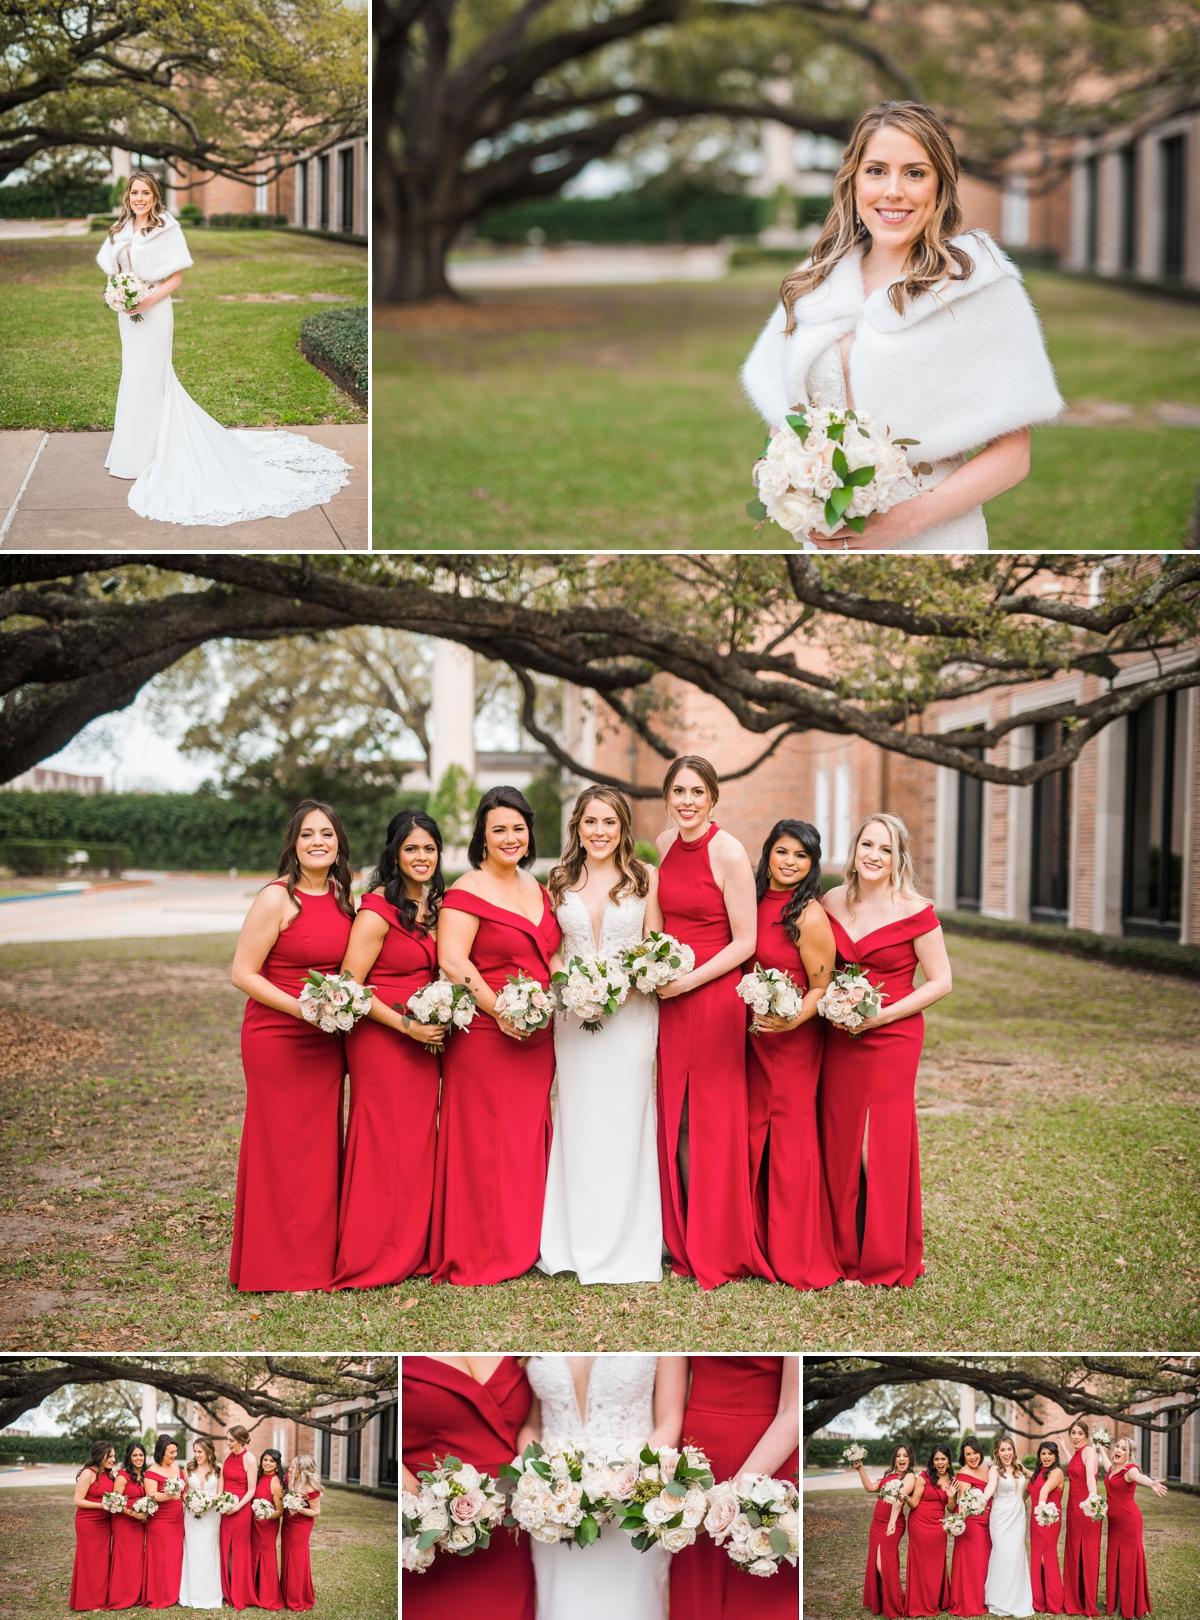 Bride and Bridesmaids at St. Luke's United Methodist Church in Houston